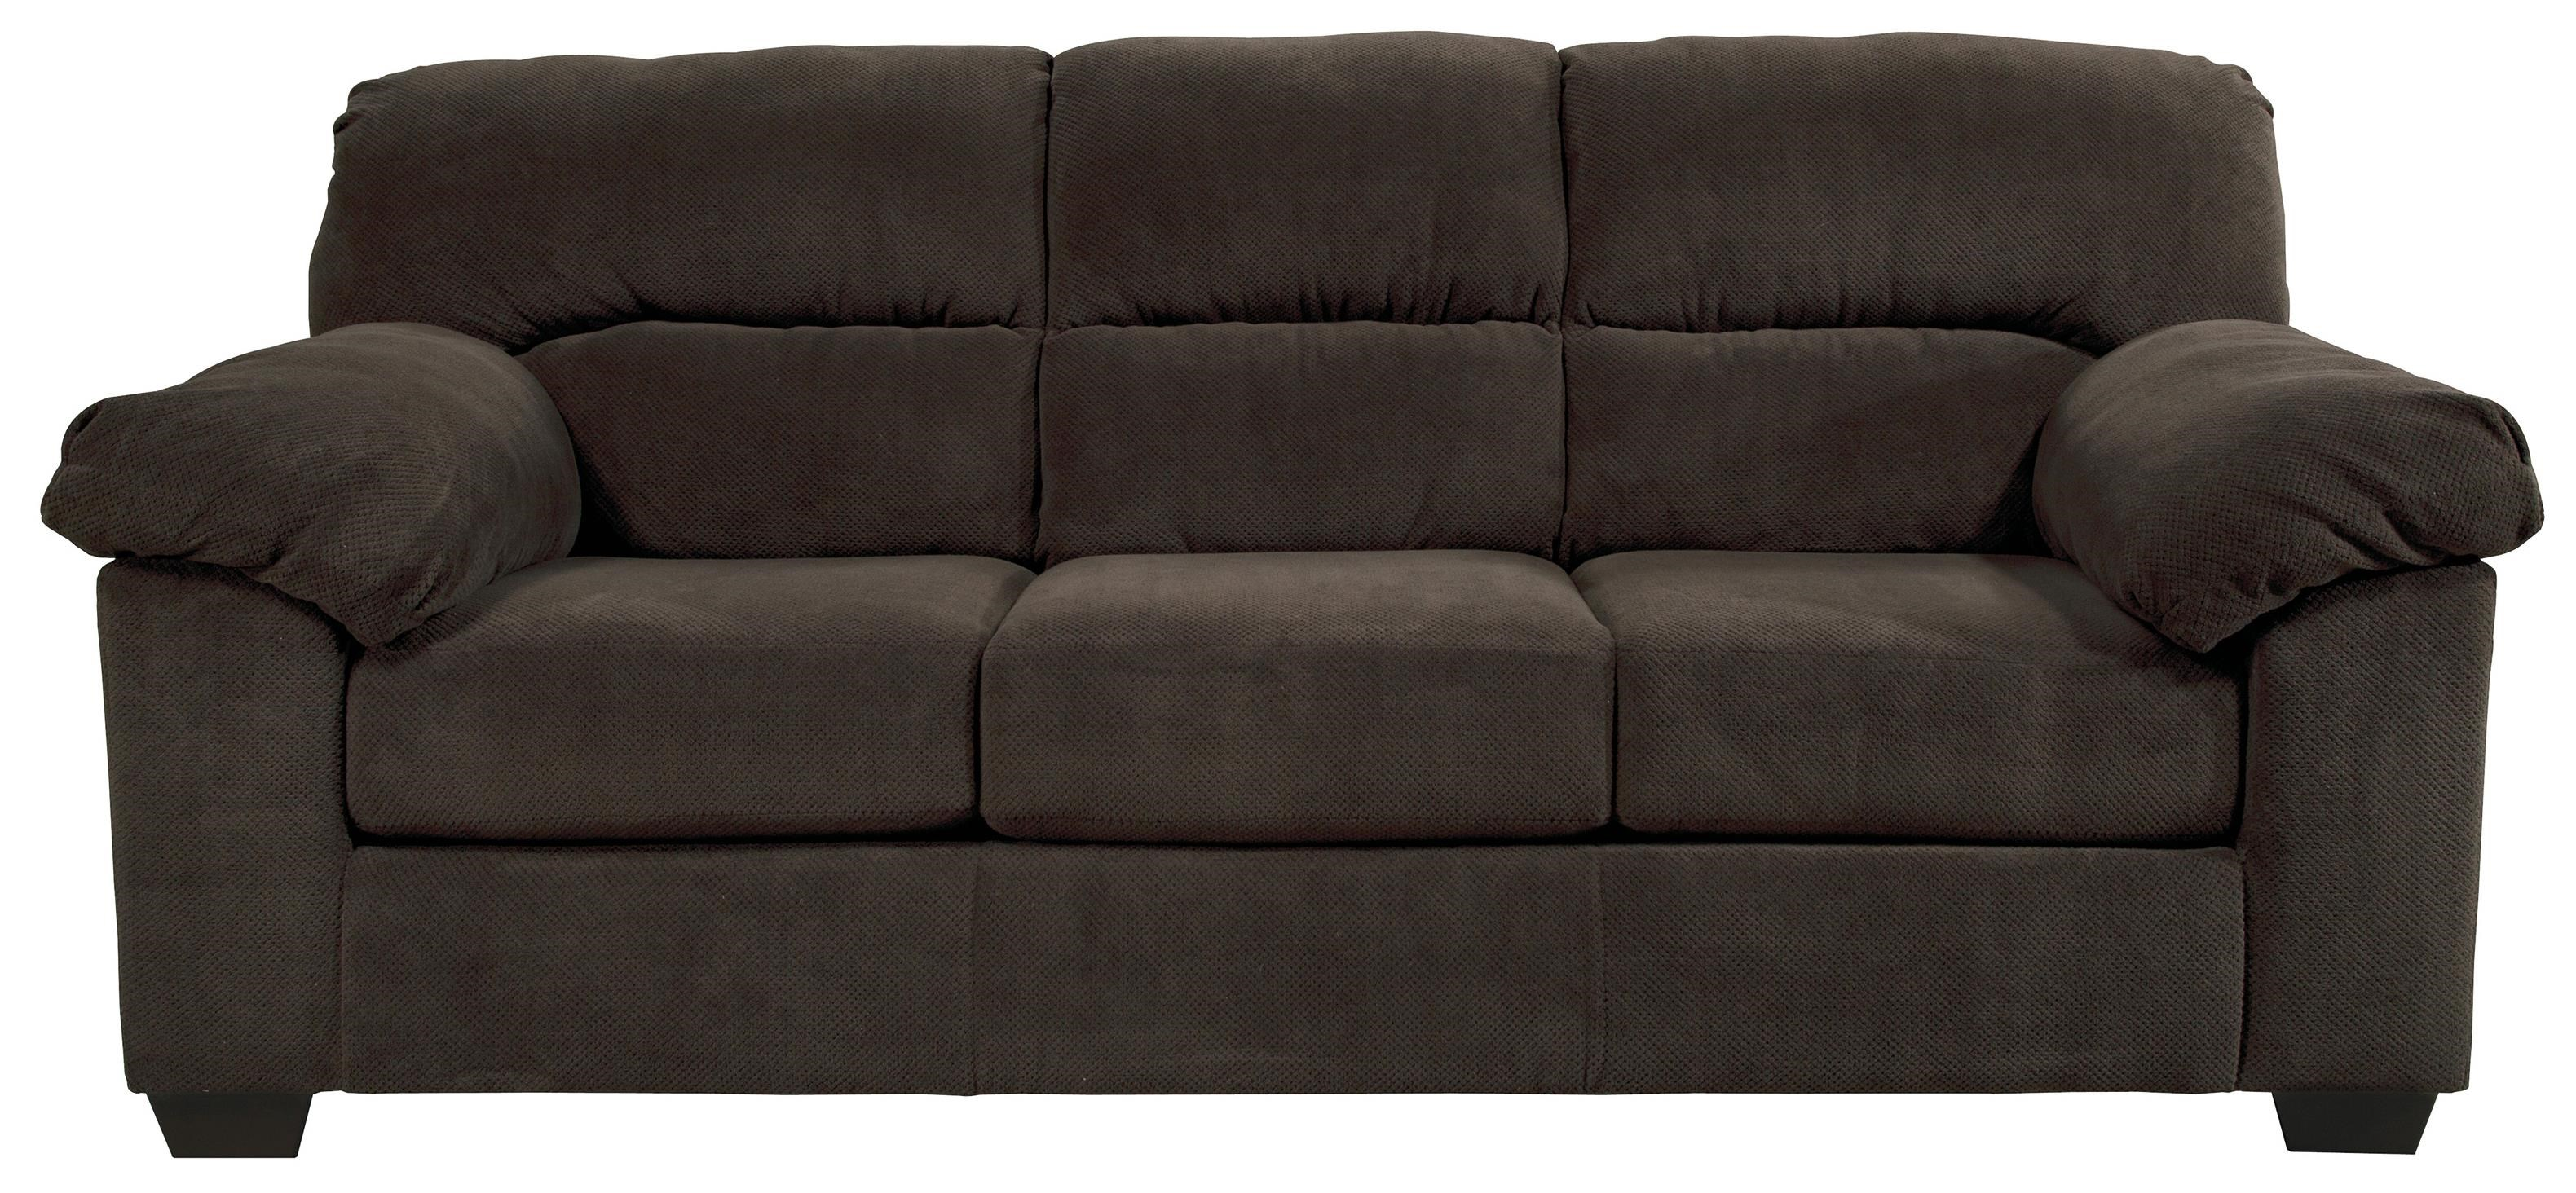 memory foam sofa reviews retro leather red sleeper mattress